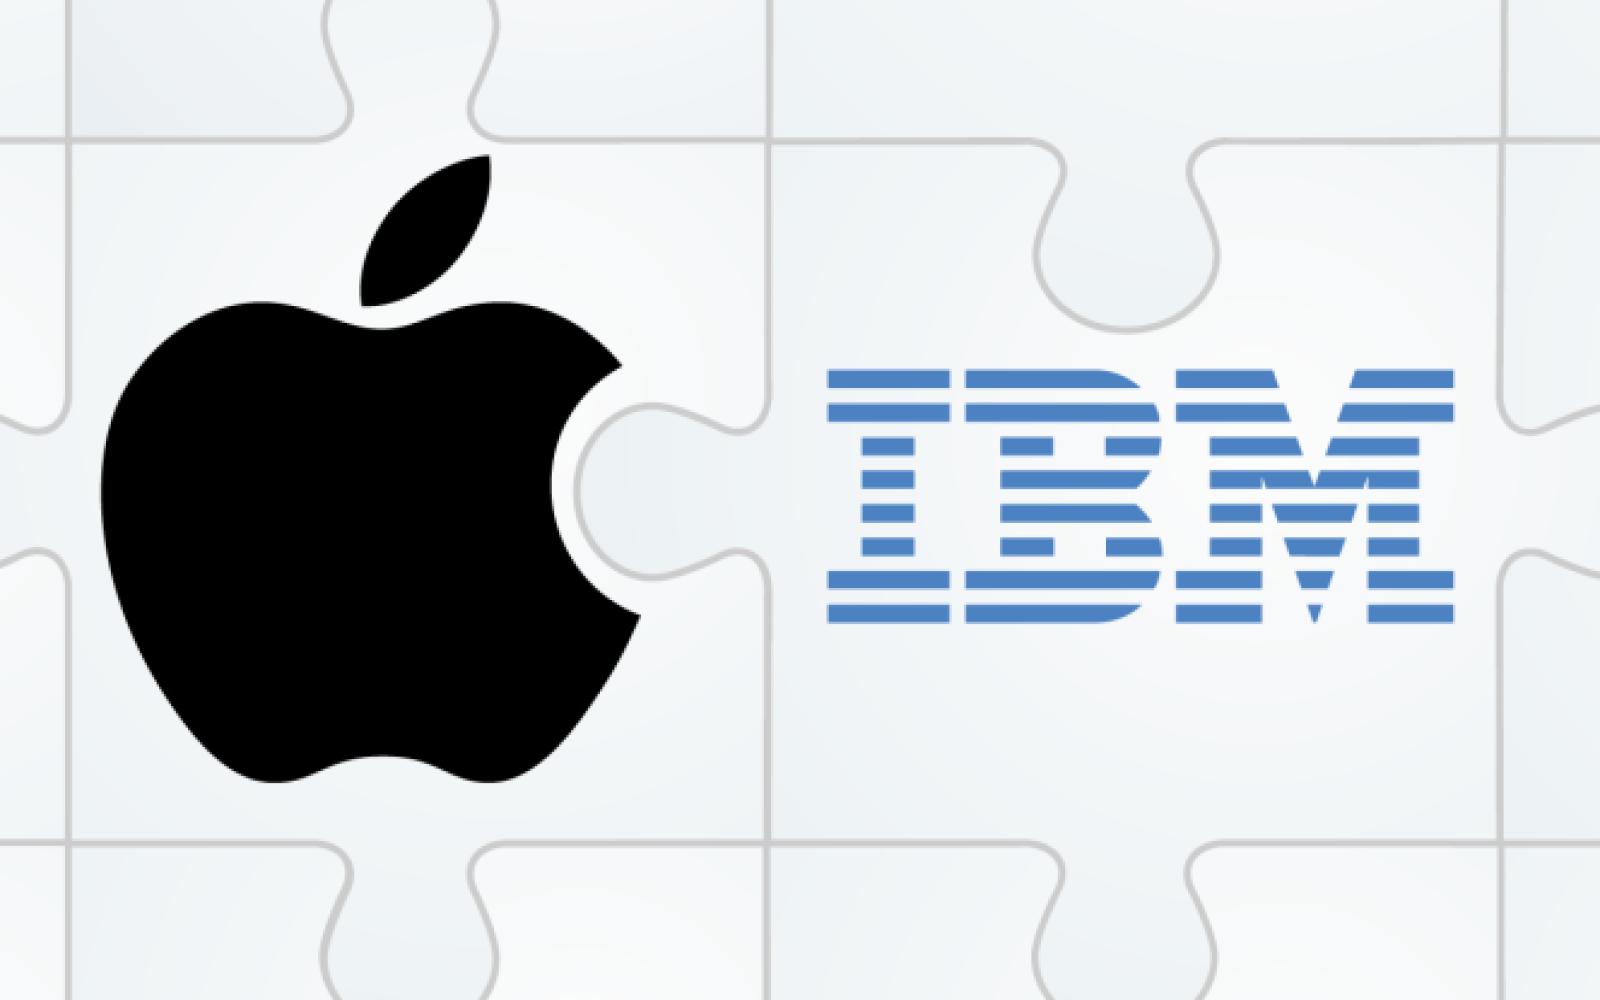 Big Data Analytics and Security Capabilities Arrive on iPhone & iPad